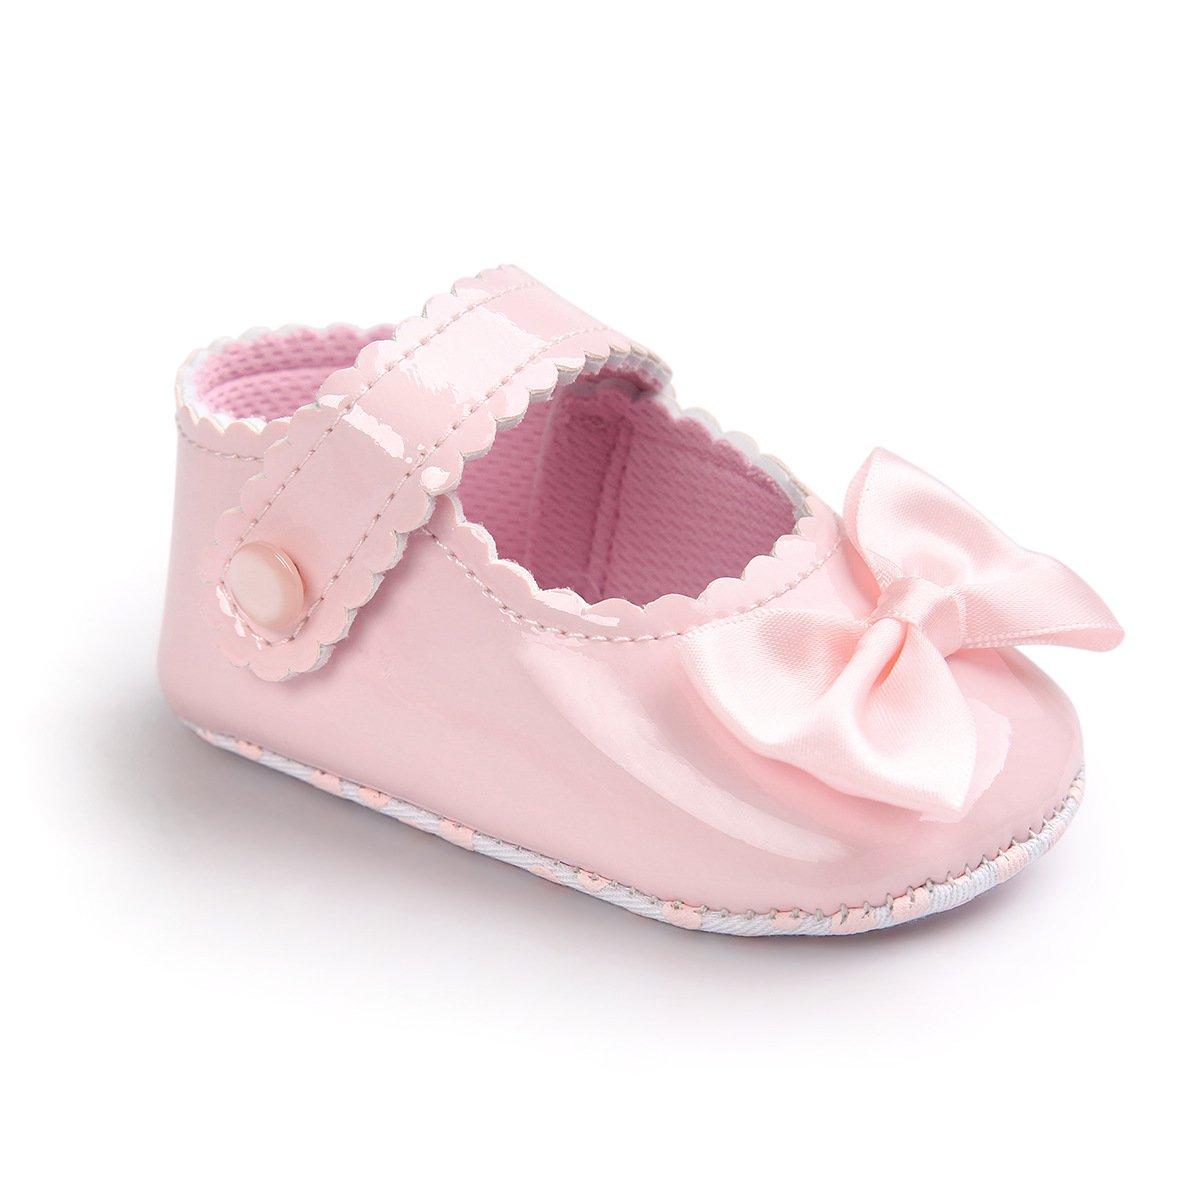 Amazon.com: Fire Frog Mary Jane - Zapatos de piel sintética ...